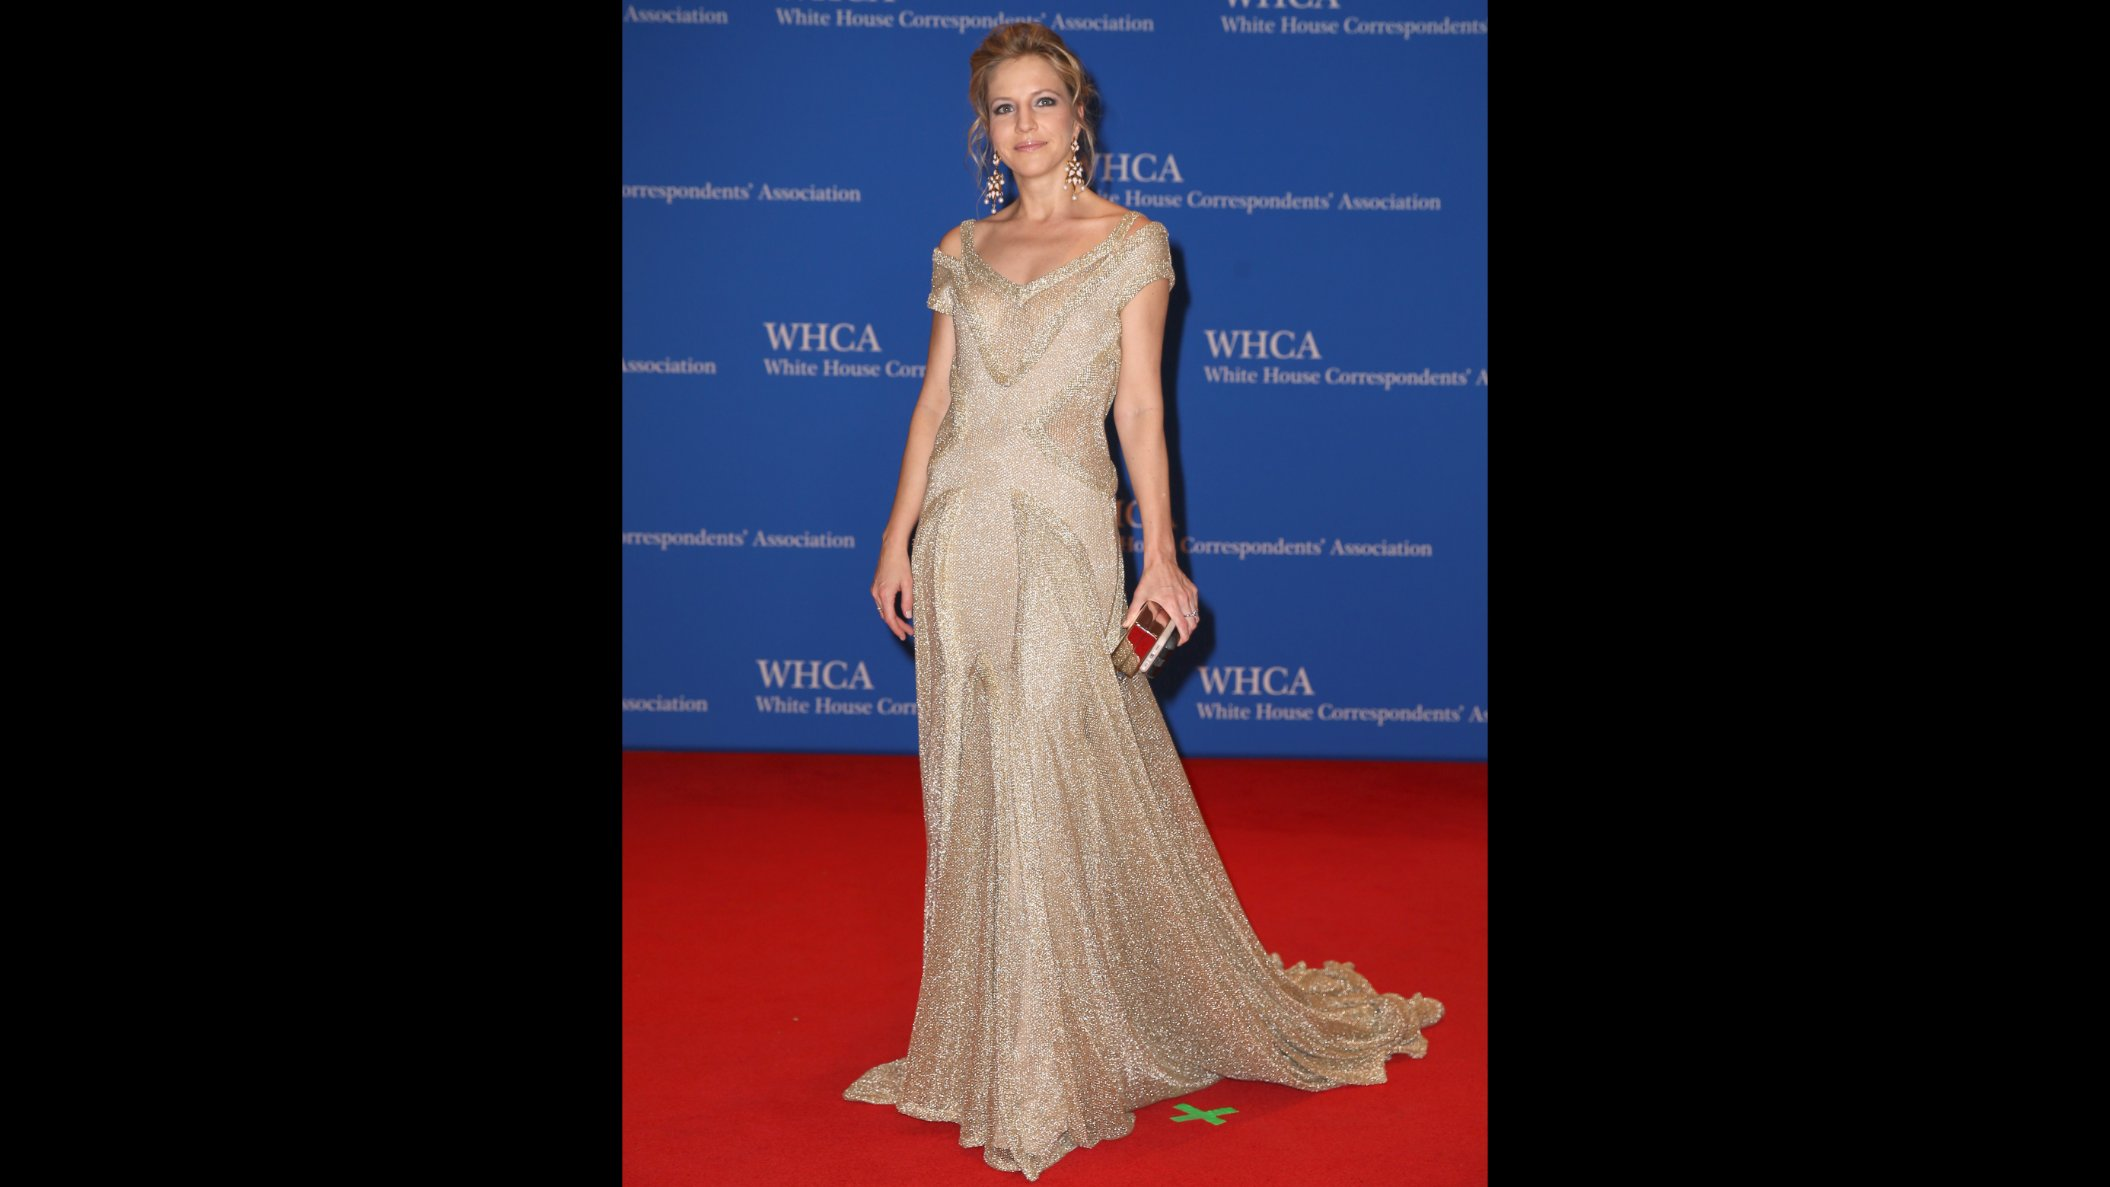 Na national treasure 2 diane kruger whitehouse dress mid bmp - Na National Treasure 2 Diane Kruger Whitehouse Dress Mid Bmp 1